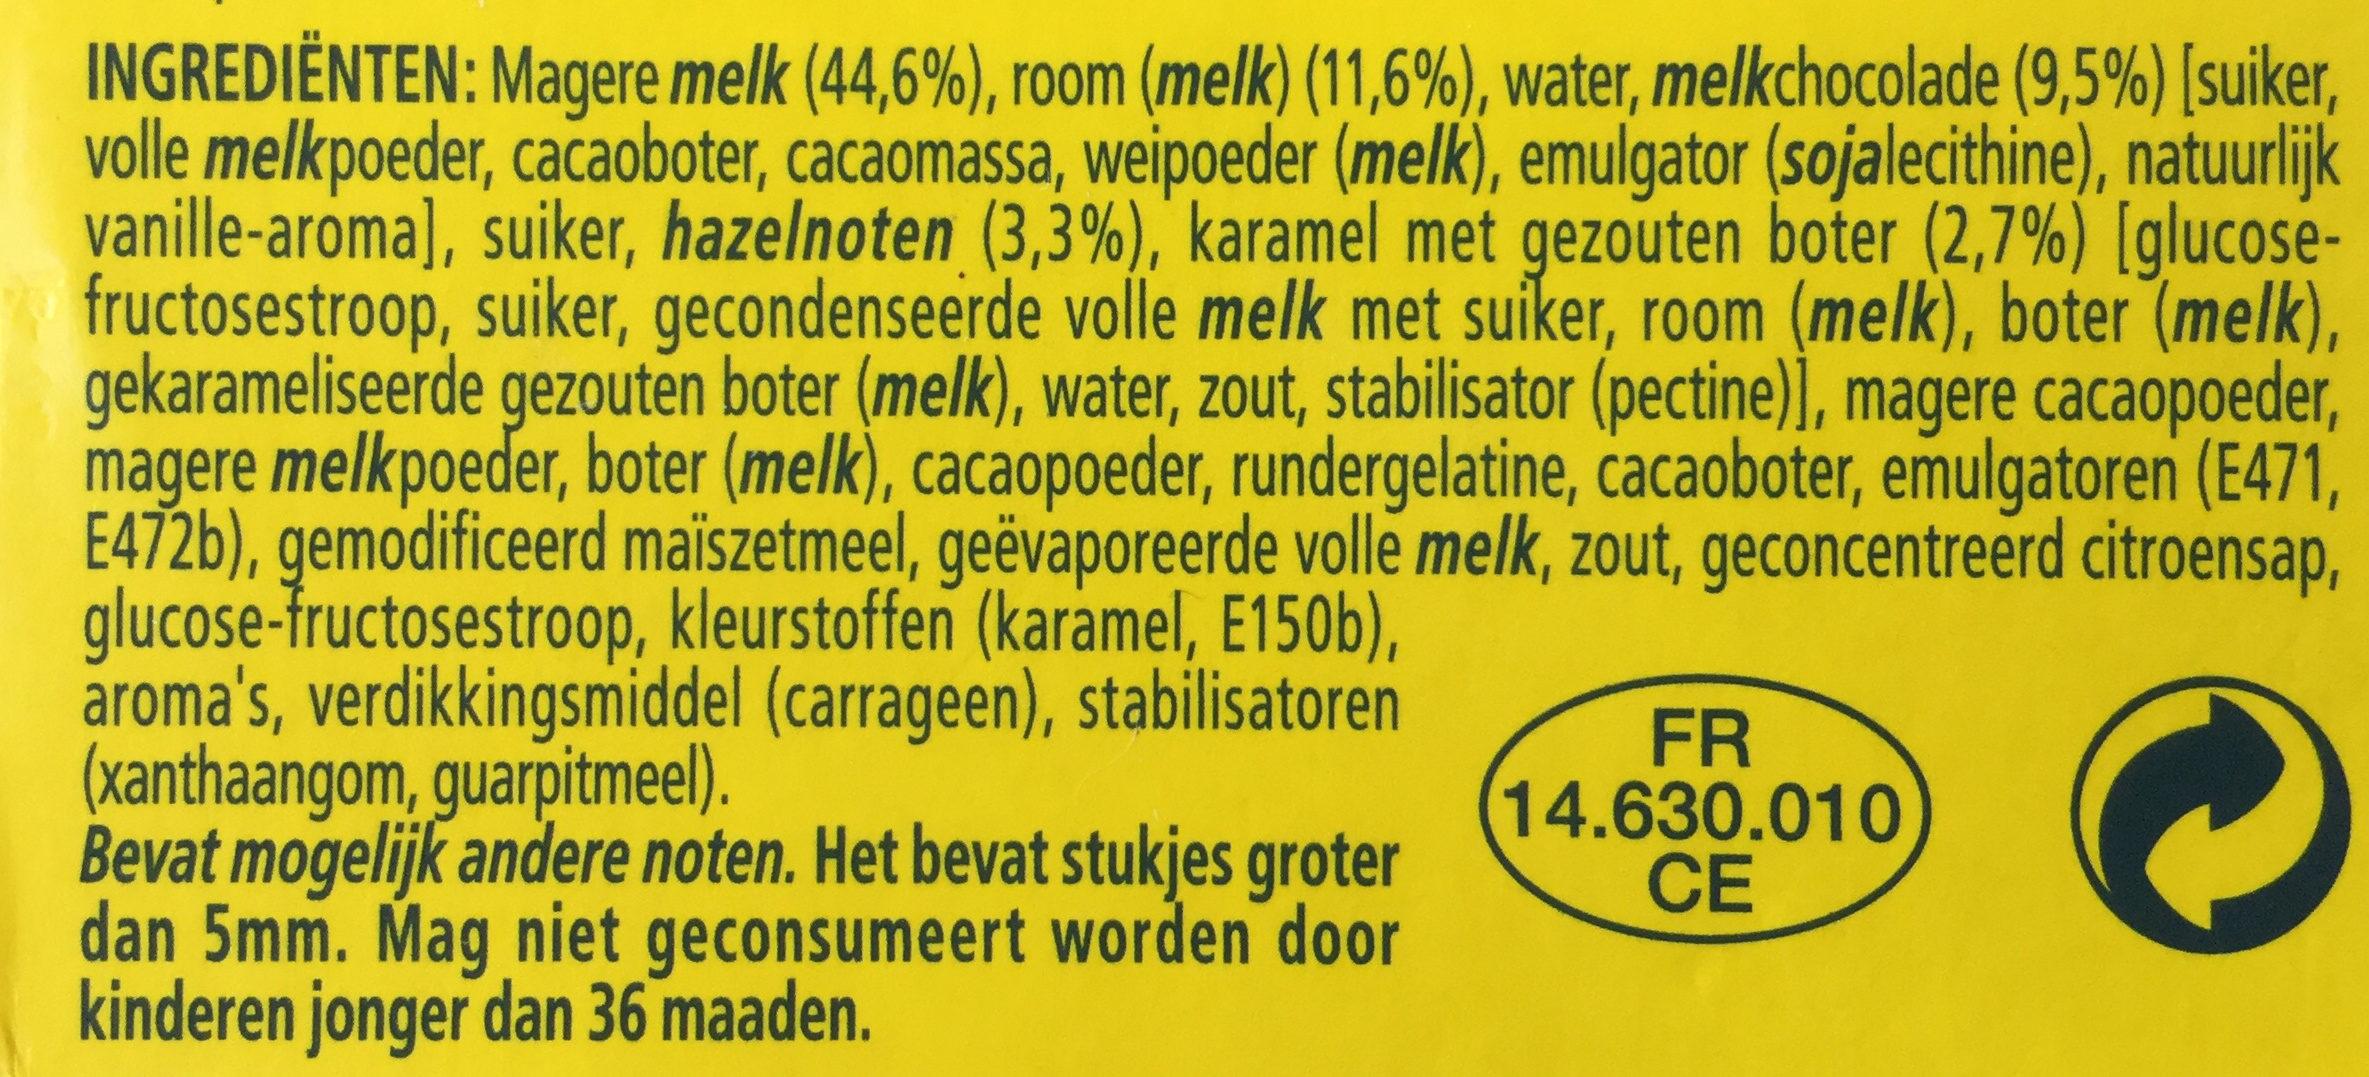 Tourbillon de mousse - Ingrediënten - nl